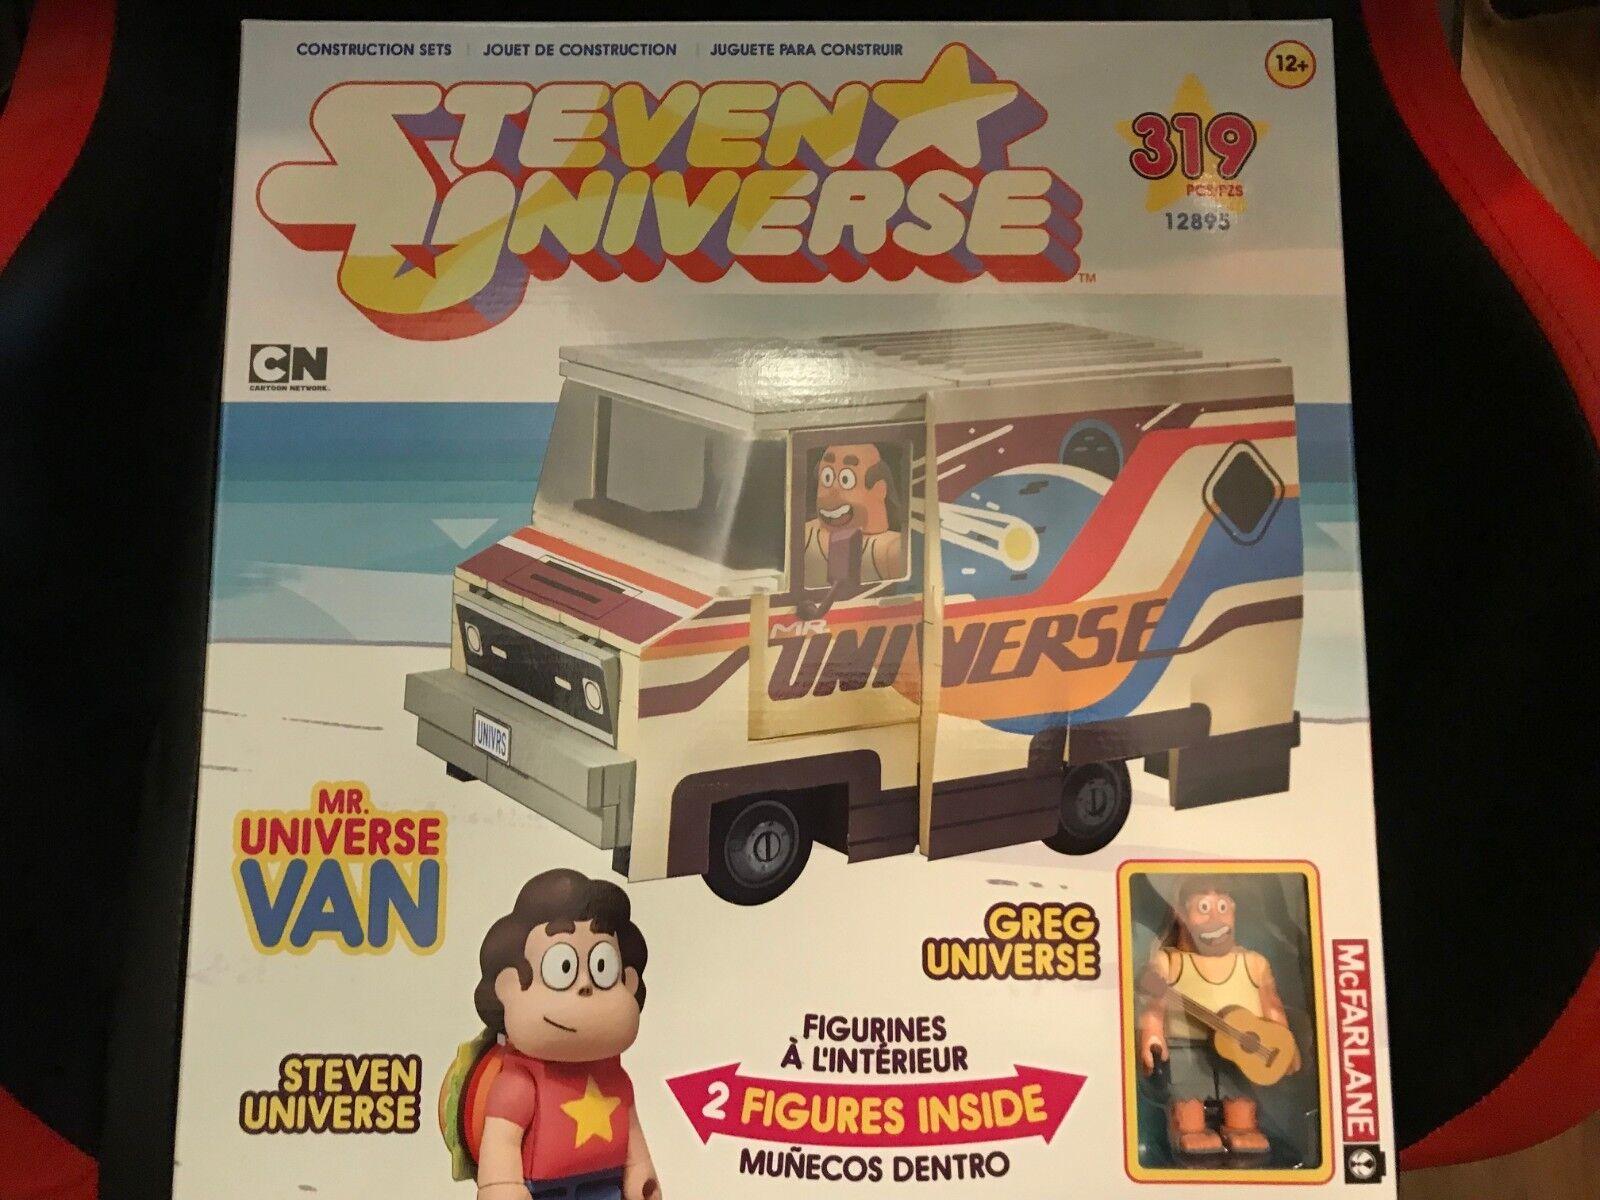 McFarlane Toys Steven Universe Greg Mr. Universe Van 319 pc Builing Set